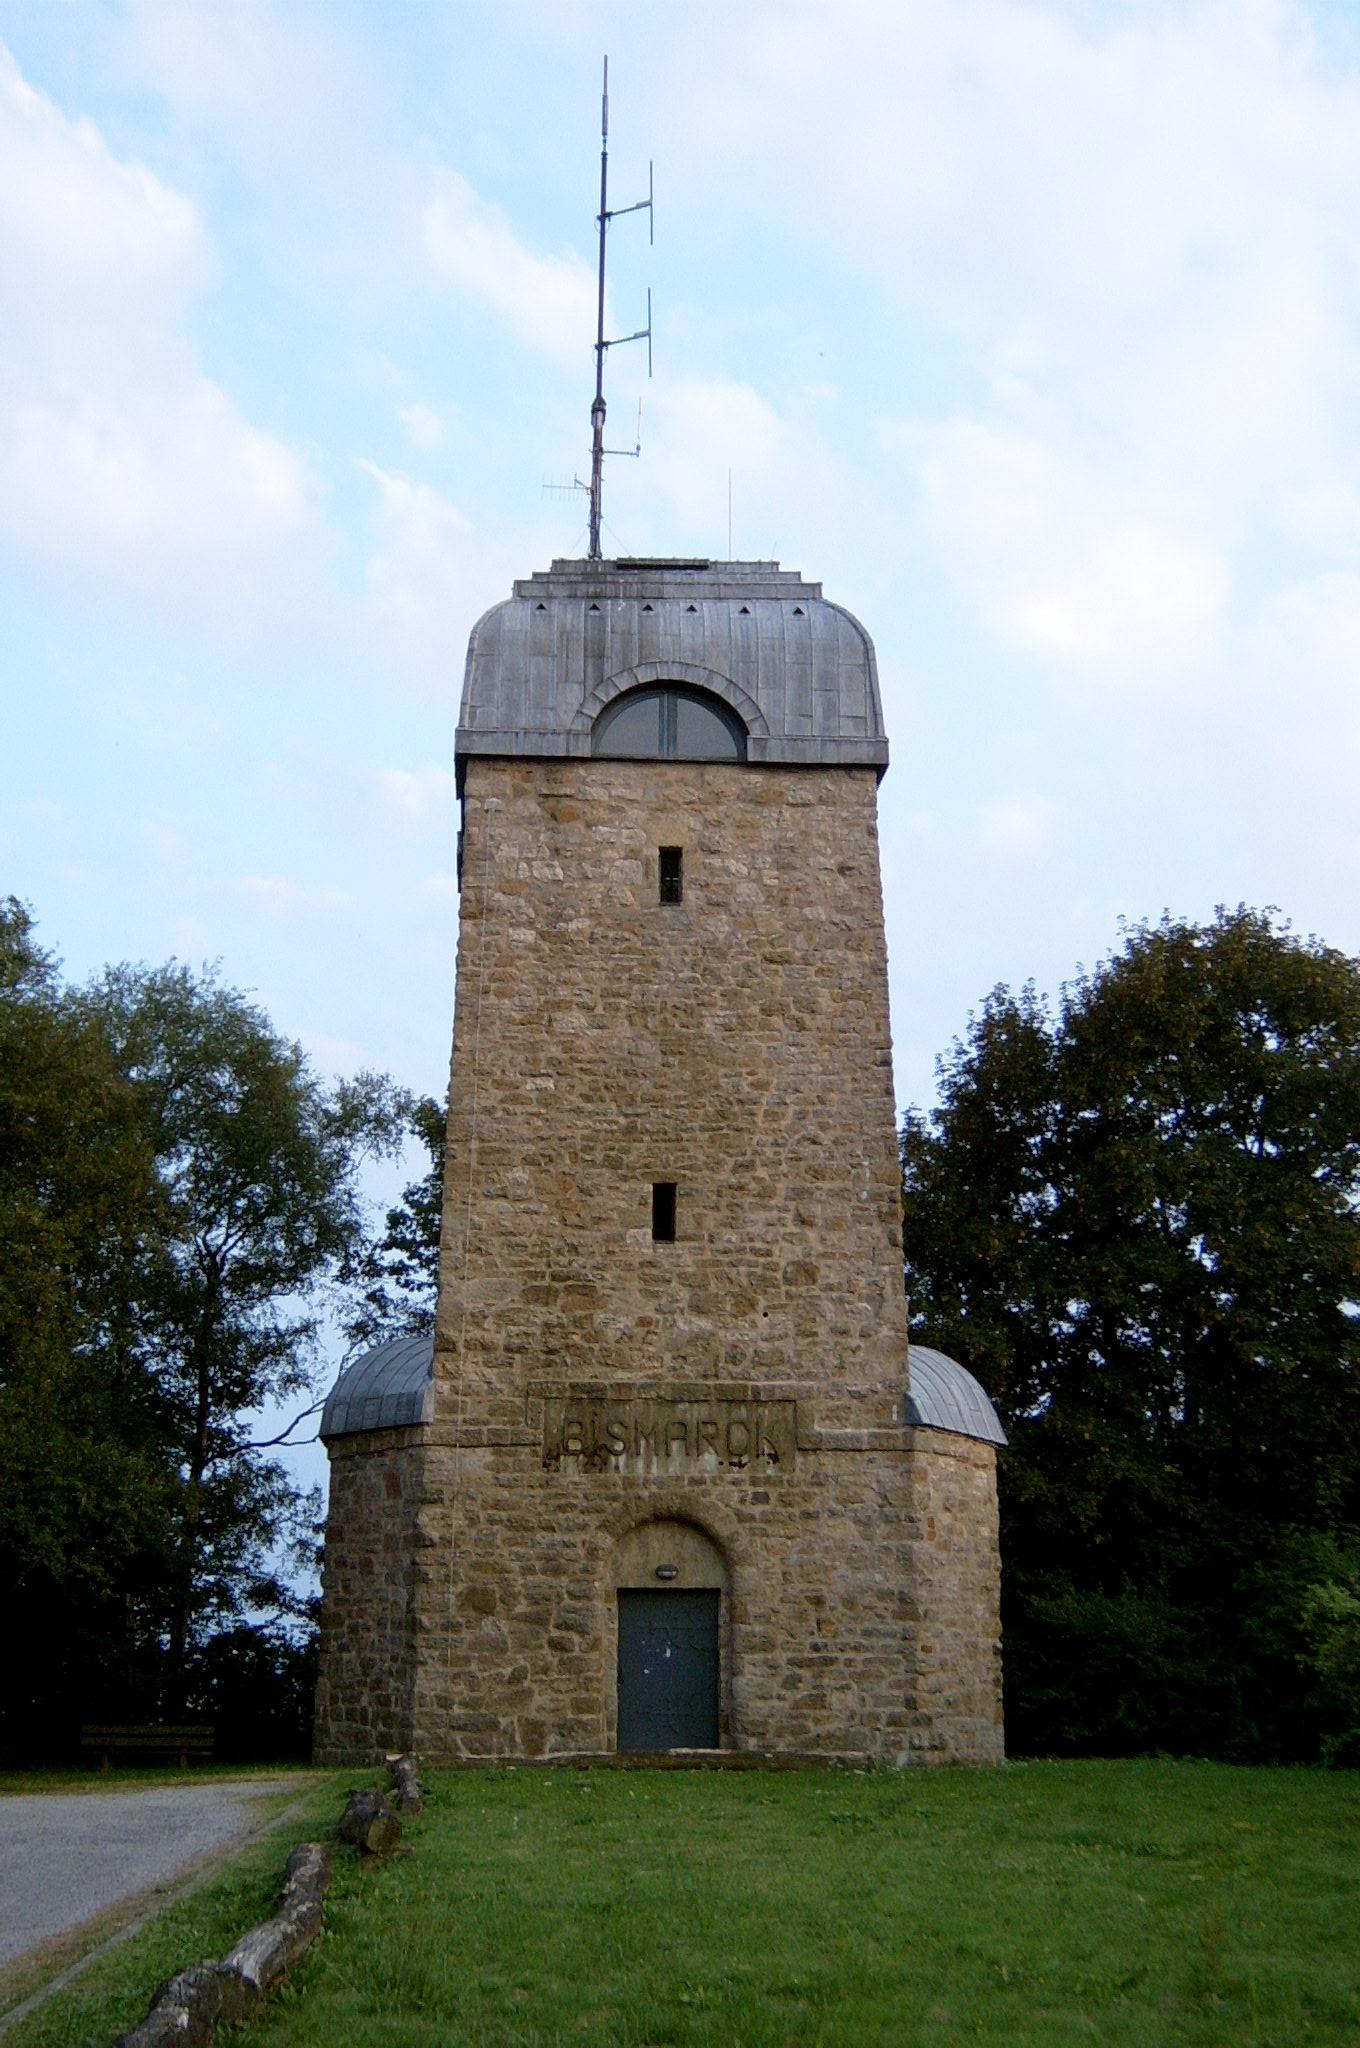 https://upload.wikimedia.org/wikipedia/commons/b/b1/Bismarckturm_%28M%C3%B6hnesee-Delecke%29.jpg